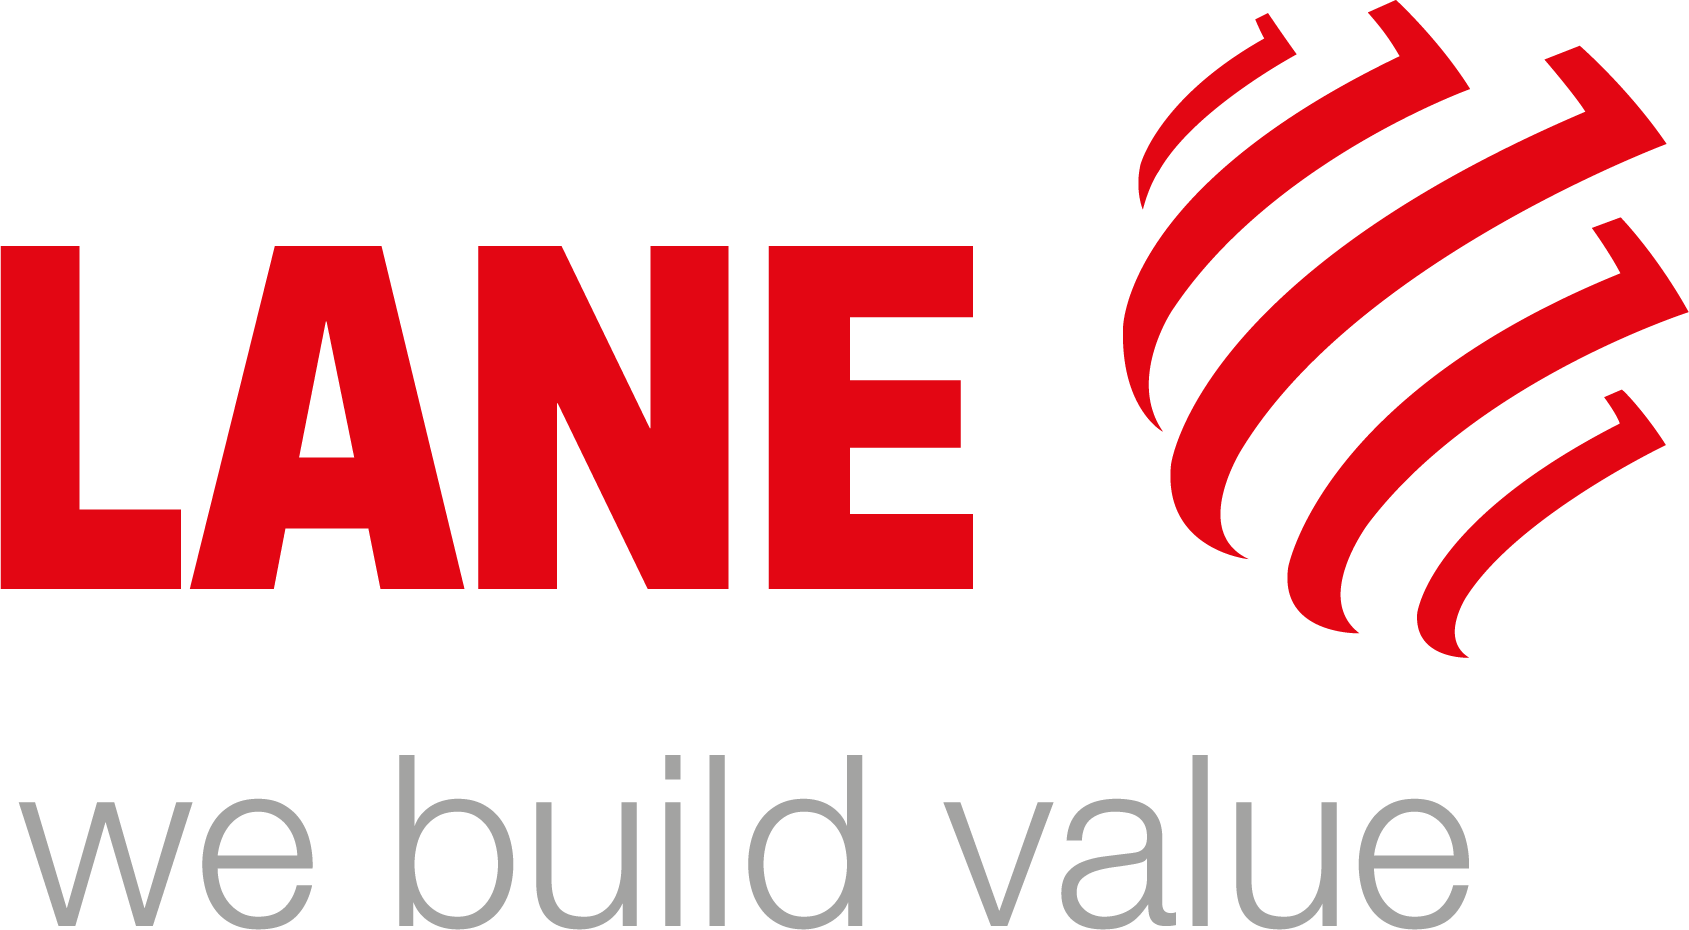 Lane_logo_claim